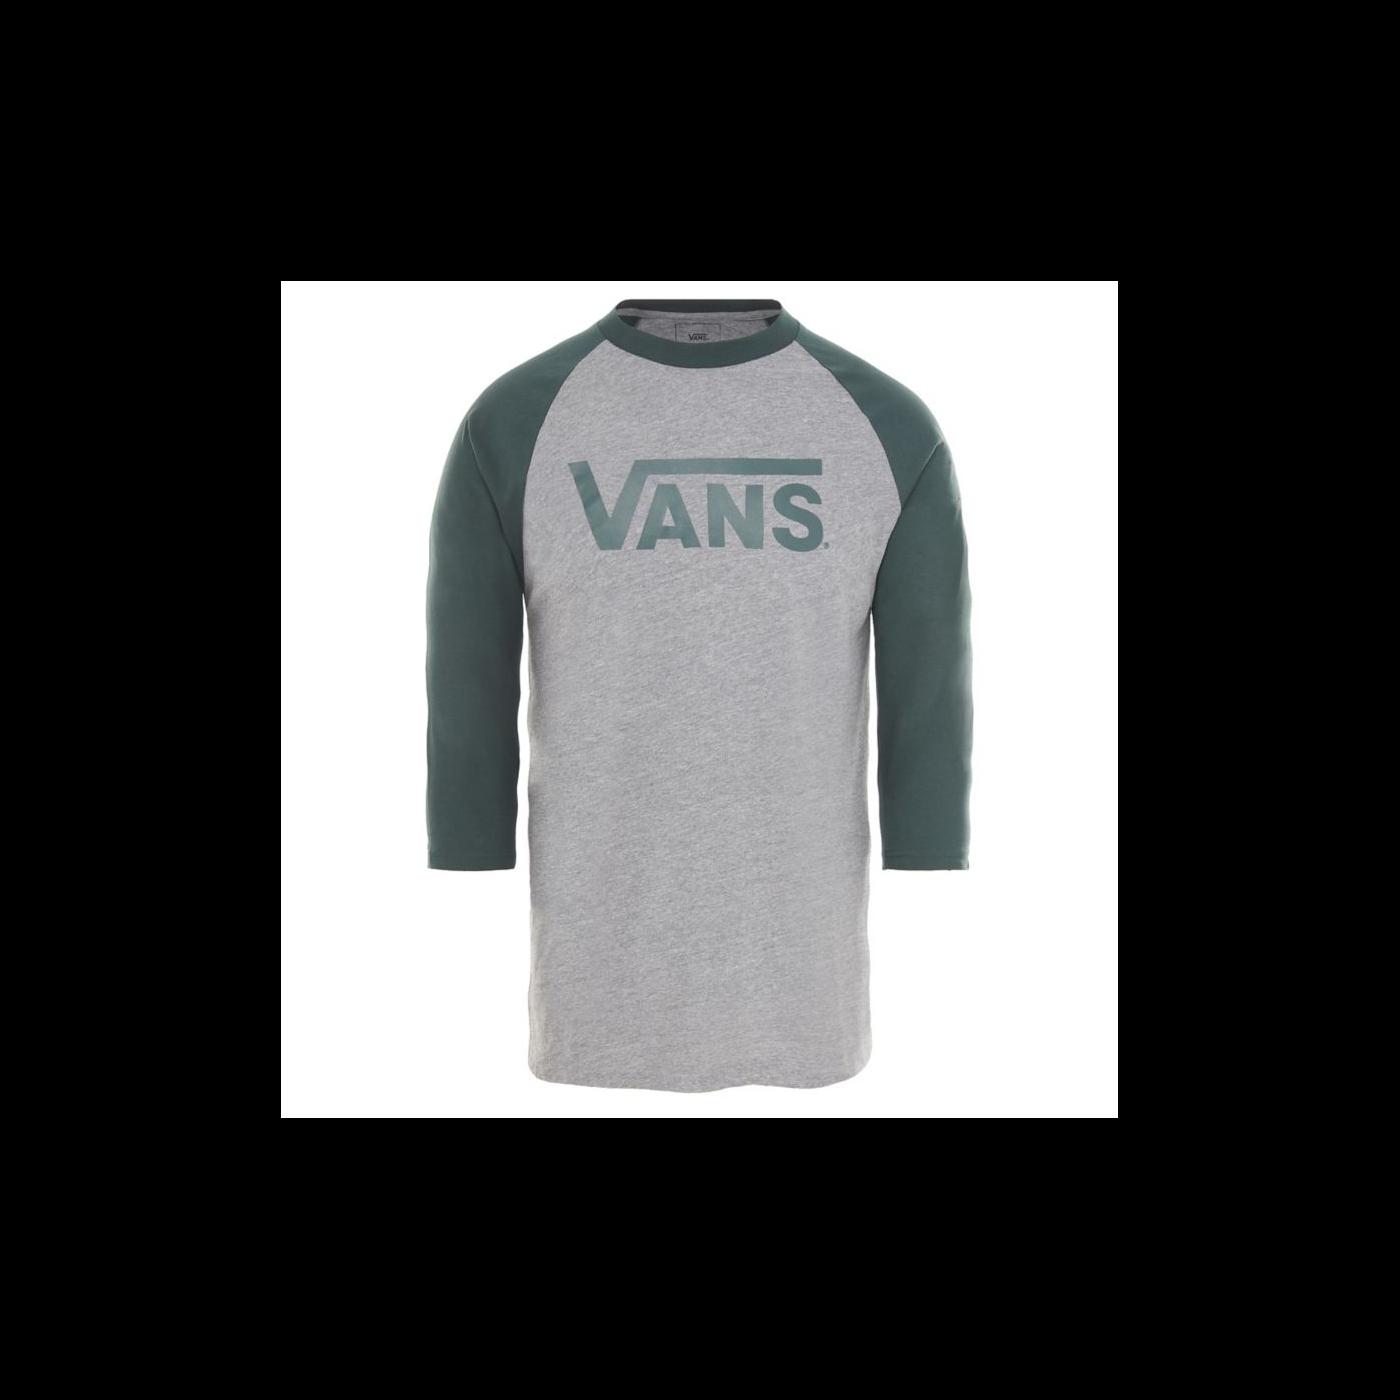 c6f3c0b98e6ec7 T-shirt Vans Classic Raglan Heather Grey Spruce